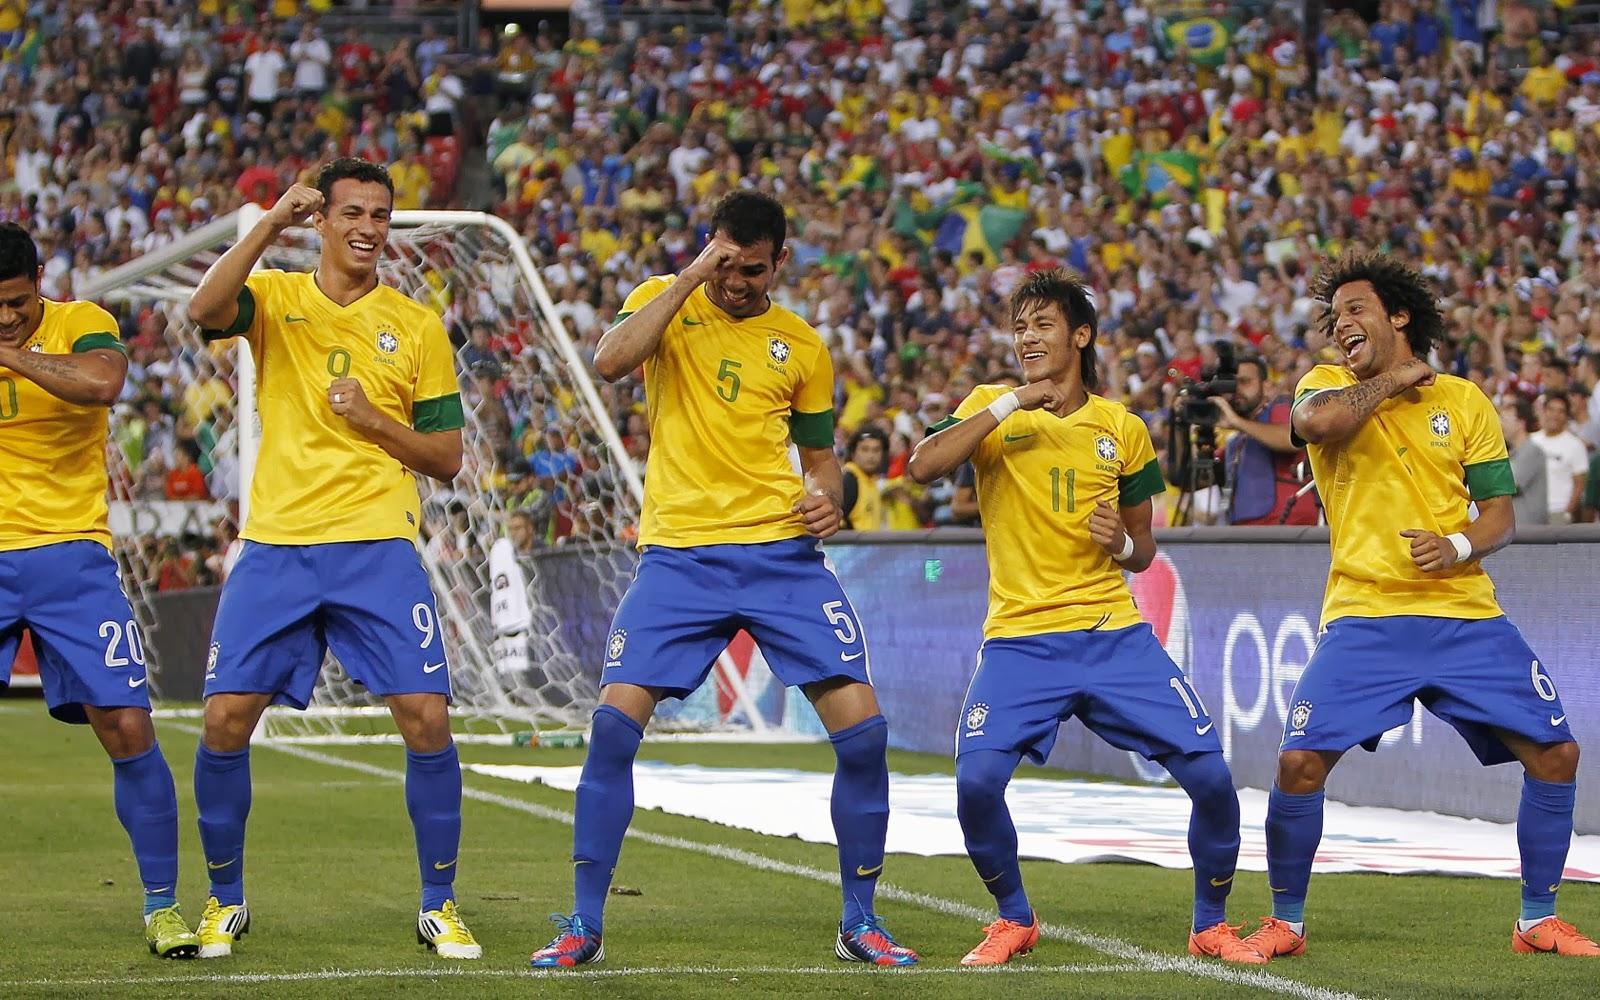 ... : ROAD TO BRAZIL 2014 - #BRAZIL (HOST NATION) - #Brazil2014 #WorldCup